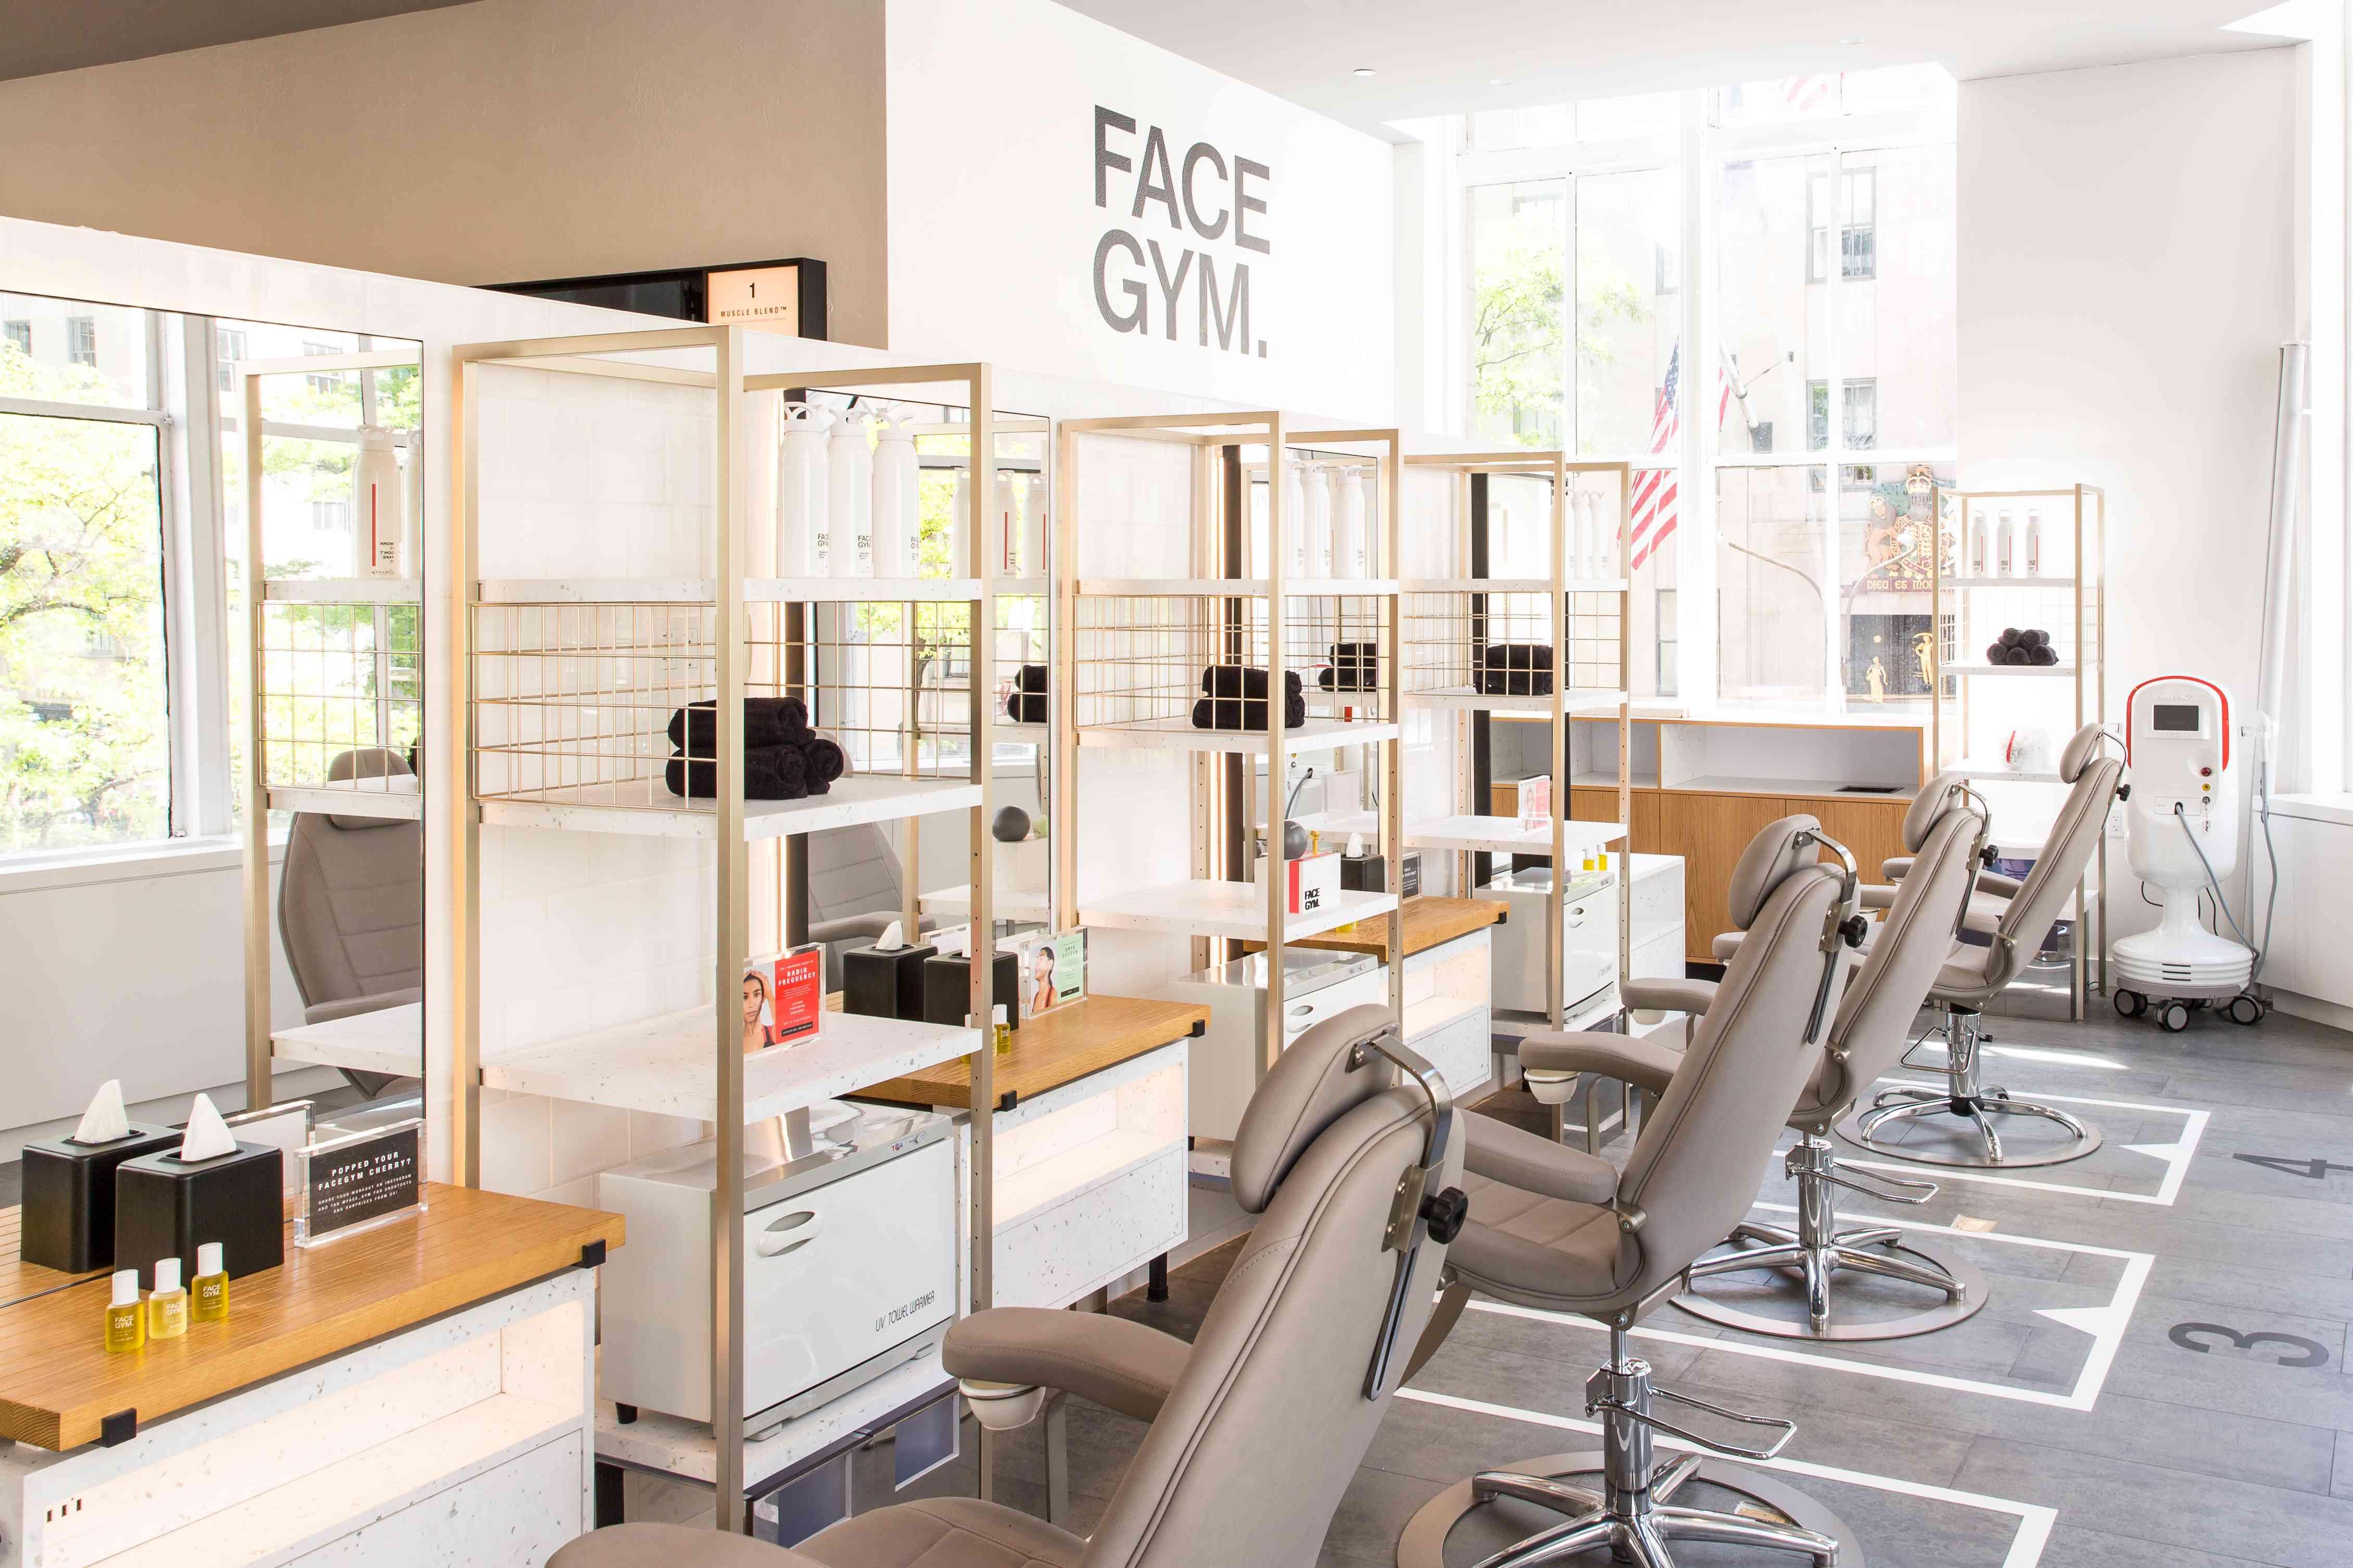 Face Gym